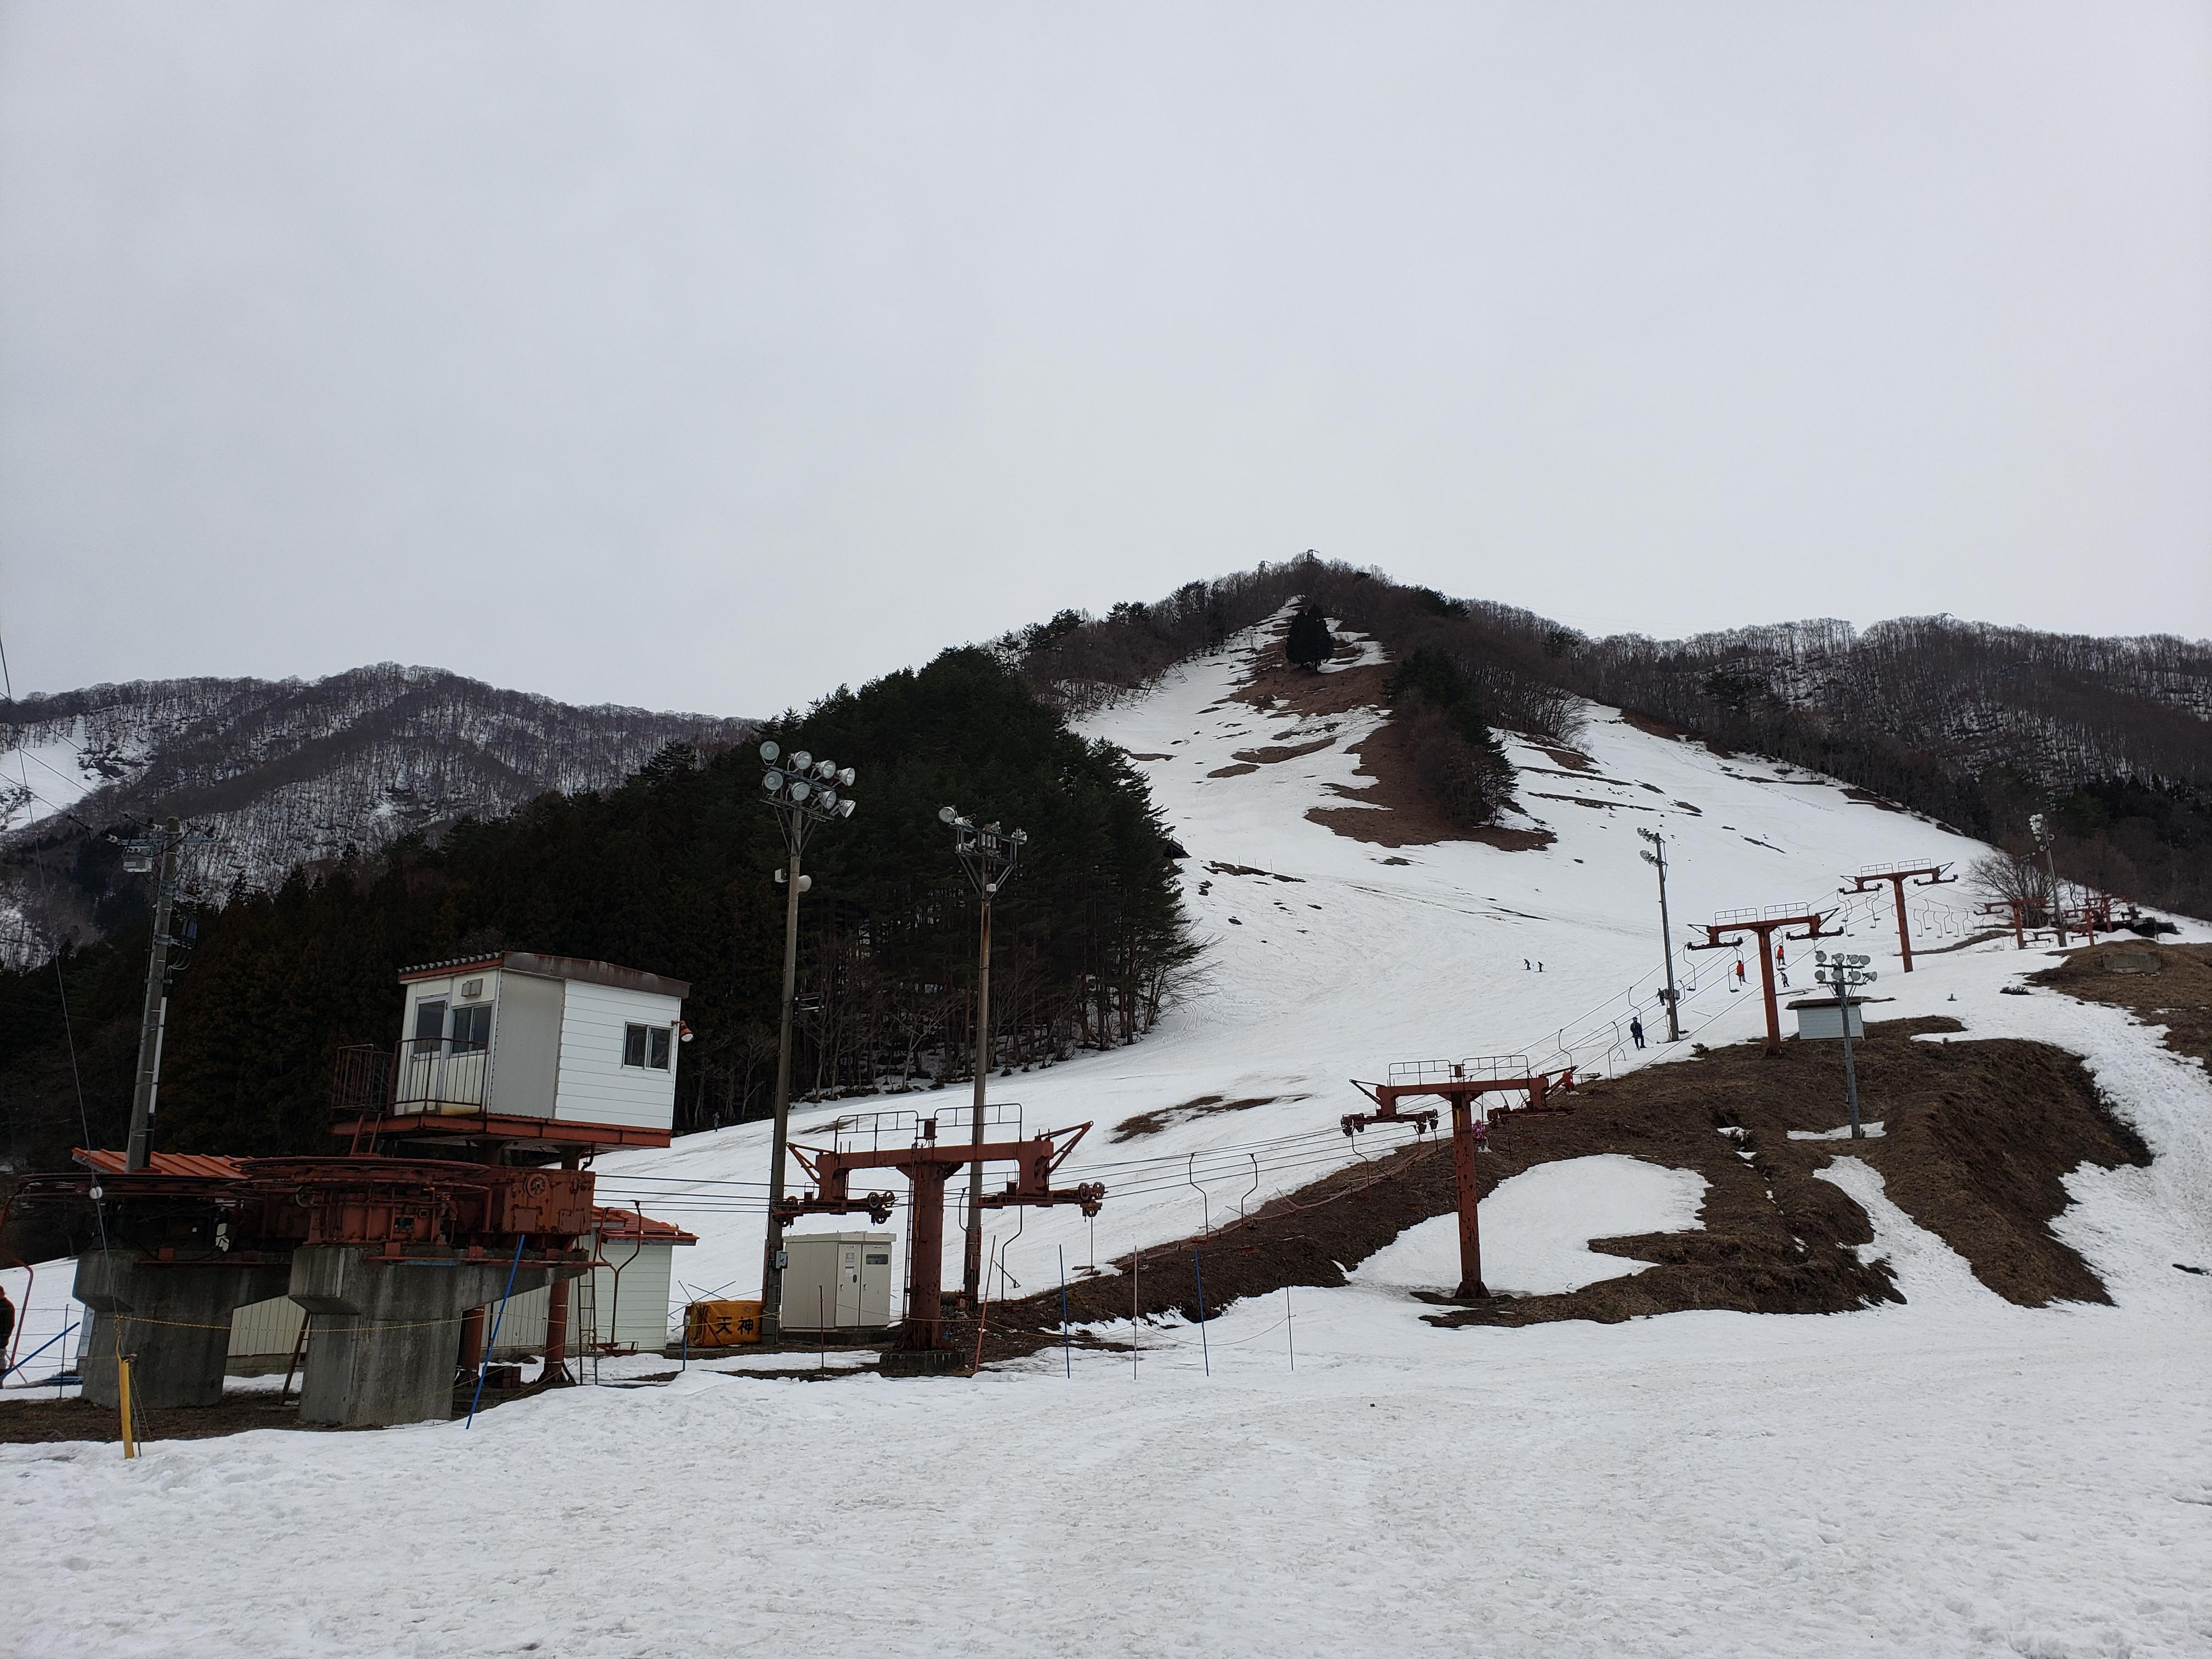 大穴スキー場 閉鎖・・・